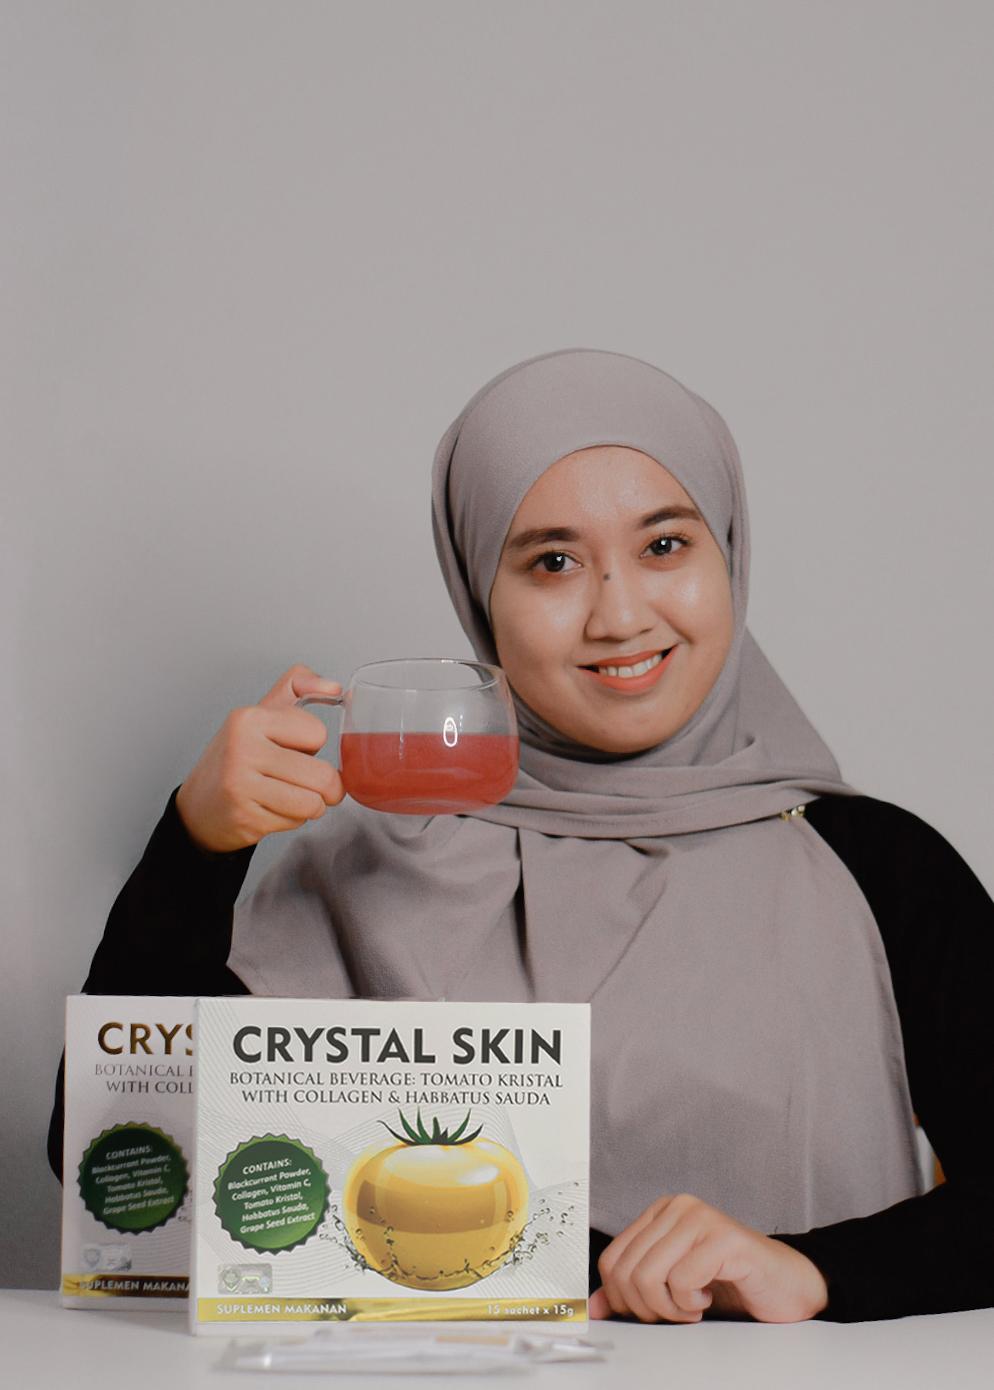 Crystal Skin RishBeauty : Tomato Kristal dengan Collagen, Habbatus Sauda